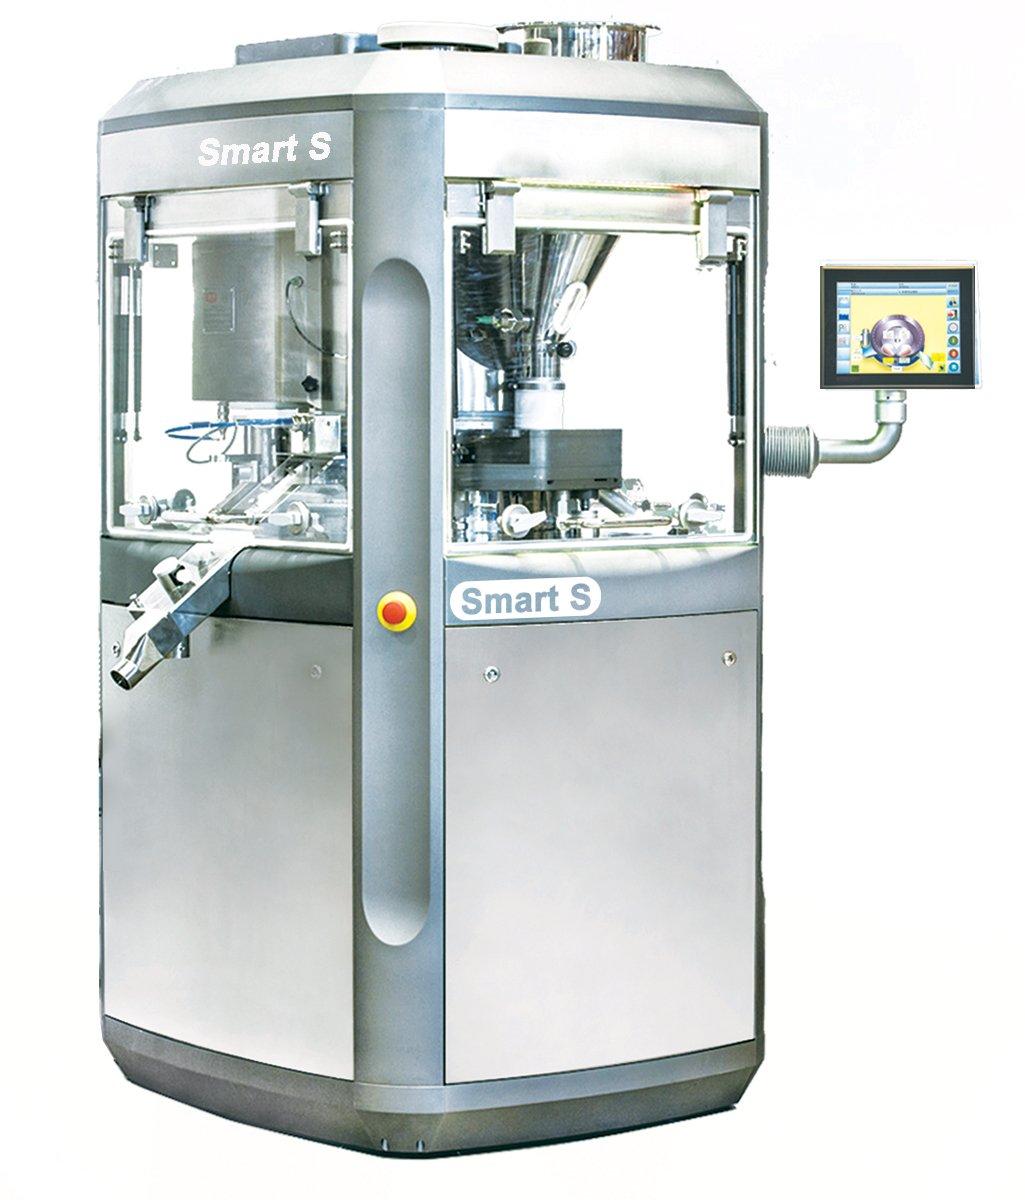 3D image of Smart S machine